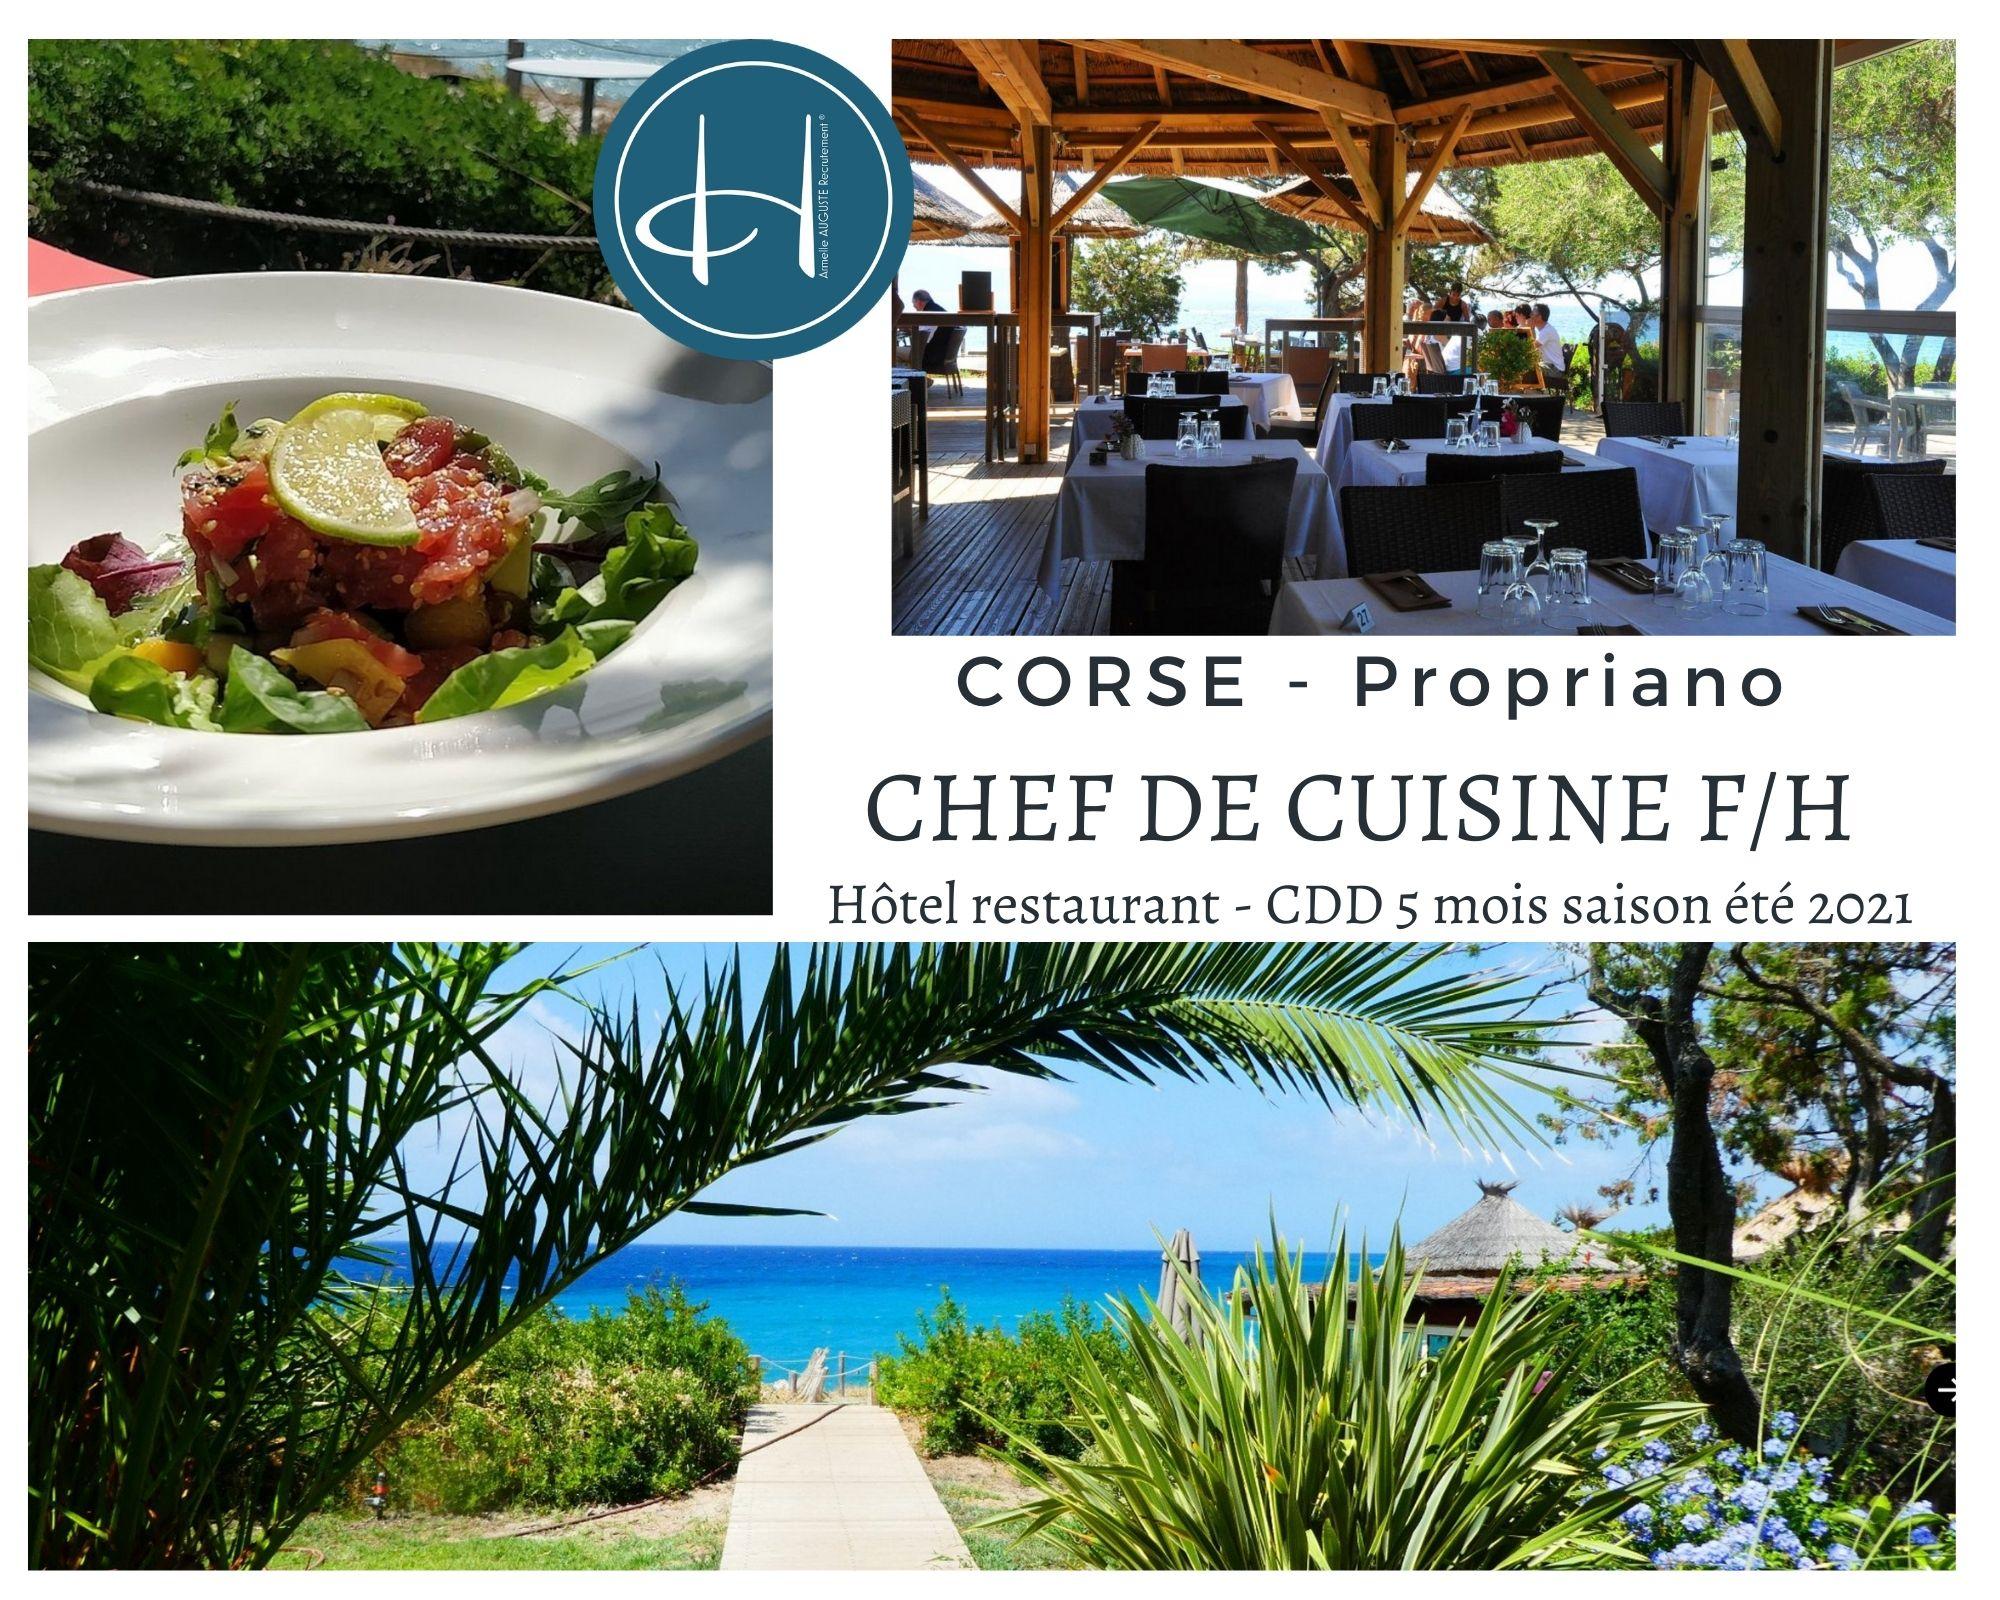 Recrutement: Chef de cuisine Corse Propriano saison été 2021 F/H chez Armelle AUGUSTE Recrutement® à Propriano